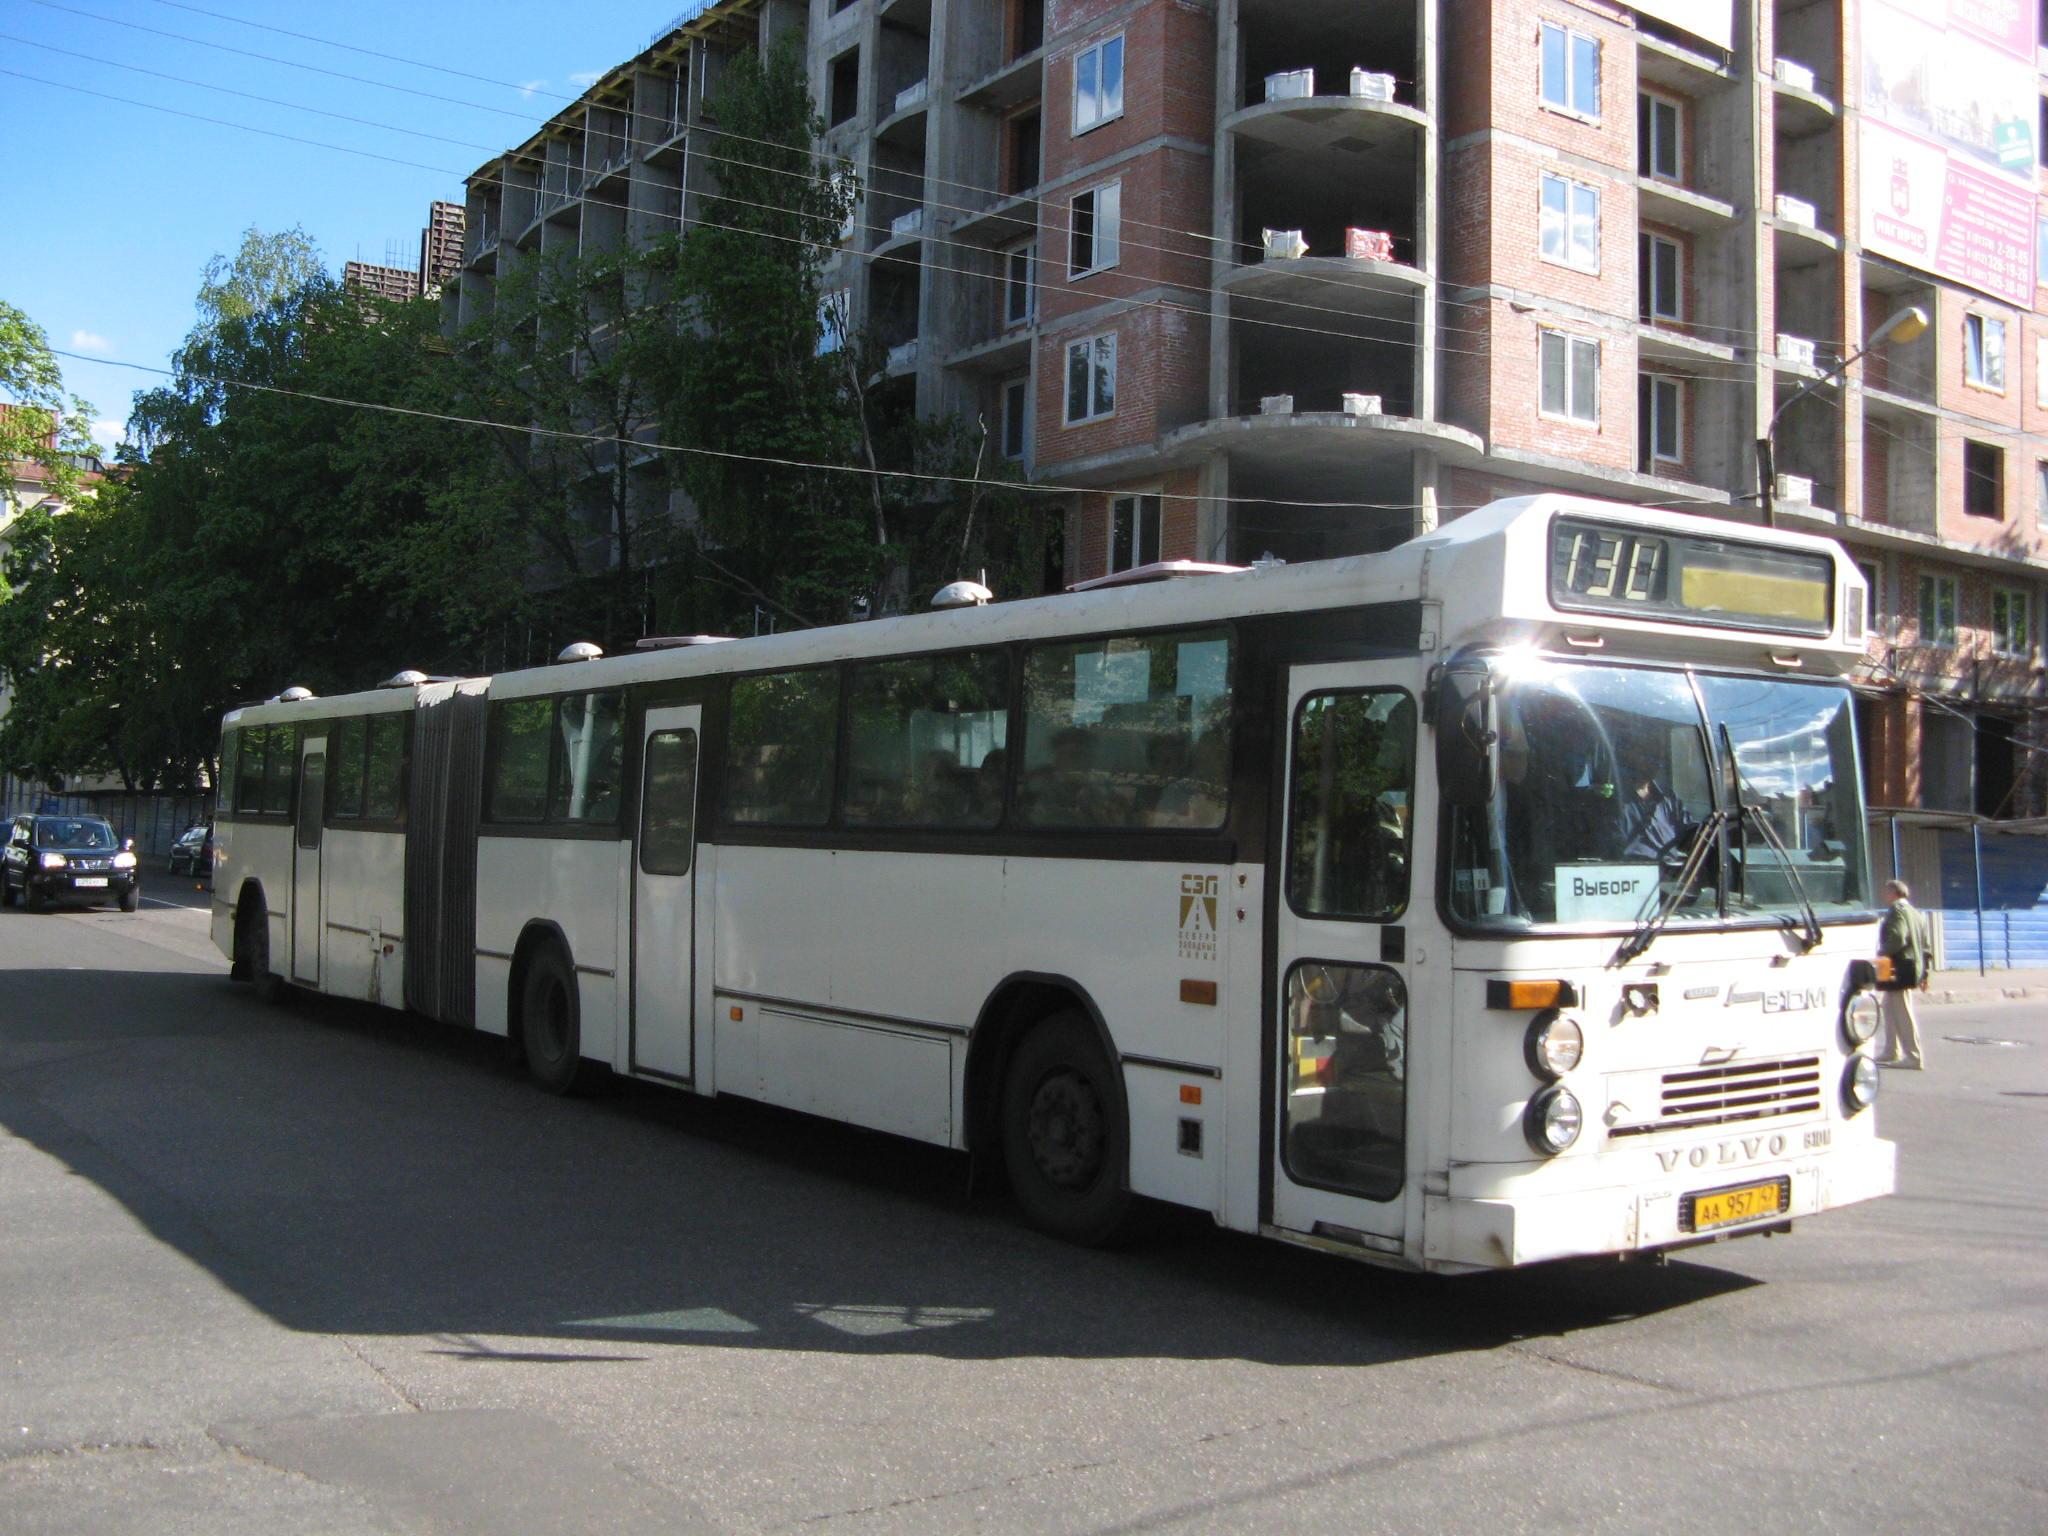 File:Volvo B10M in Vyborg.jpg - Wikimedia Commons